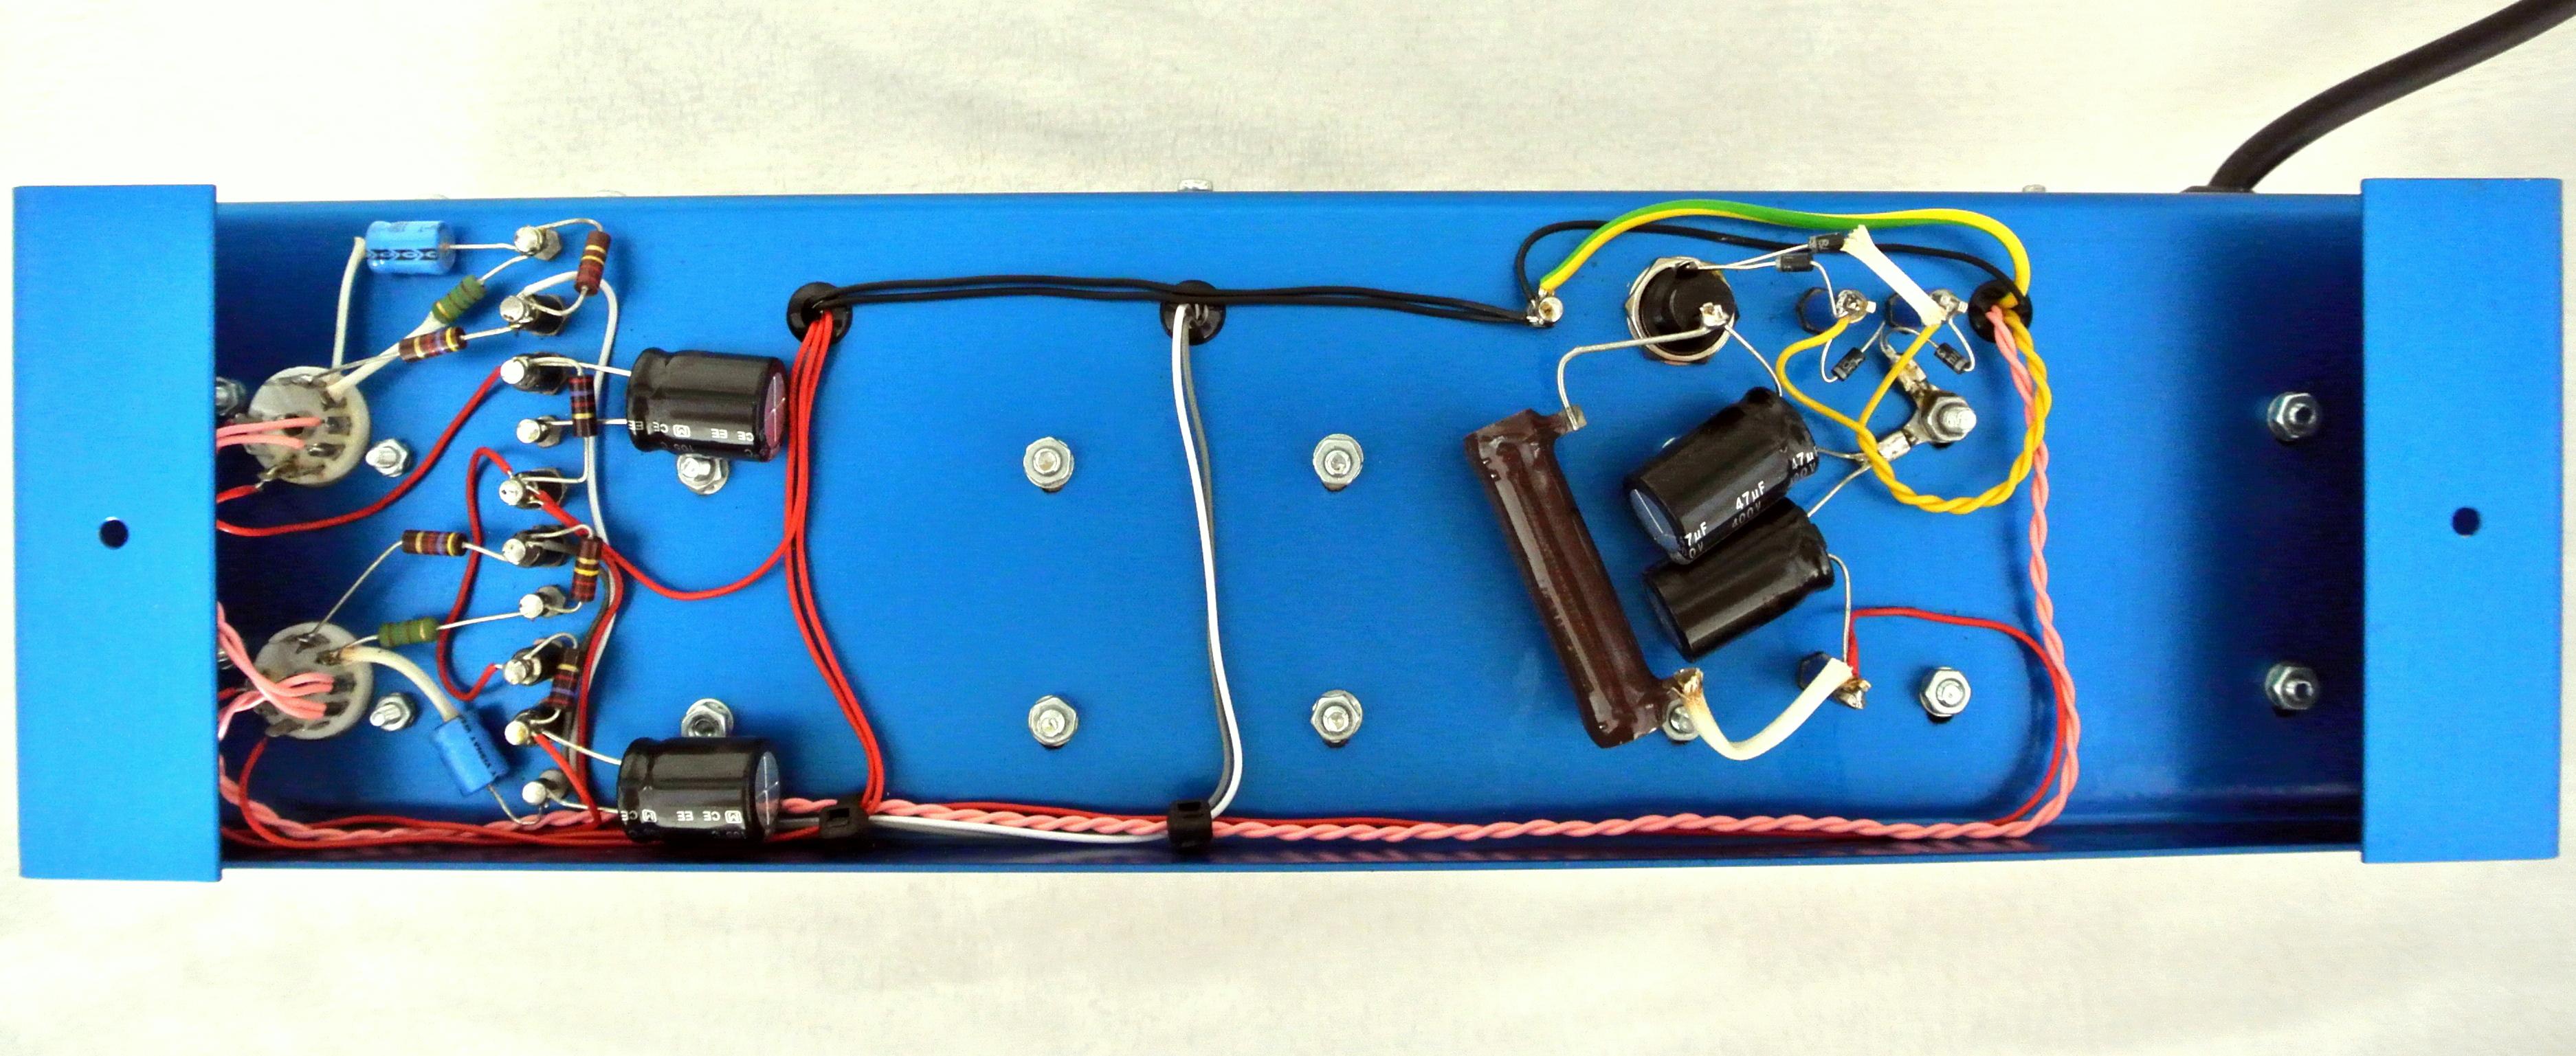 6V6 Model in Anodized (Electric) Blue - Underside